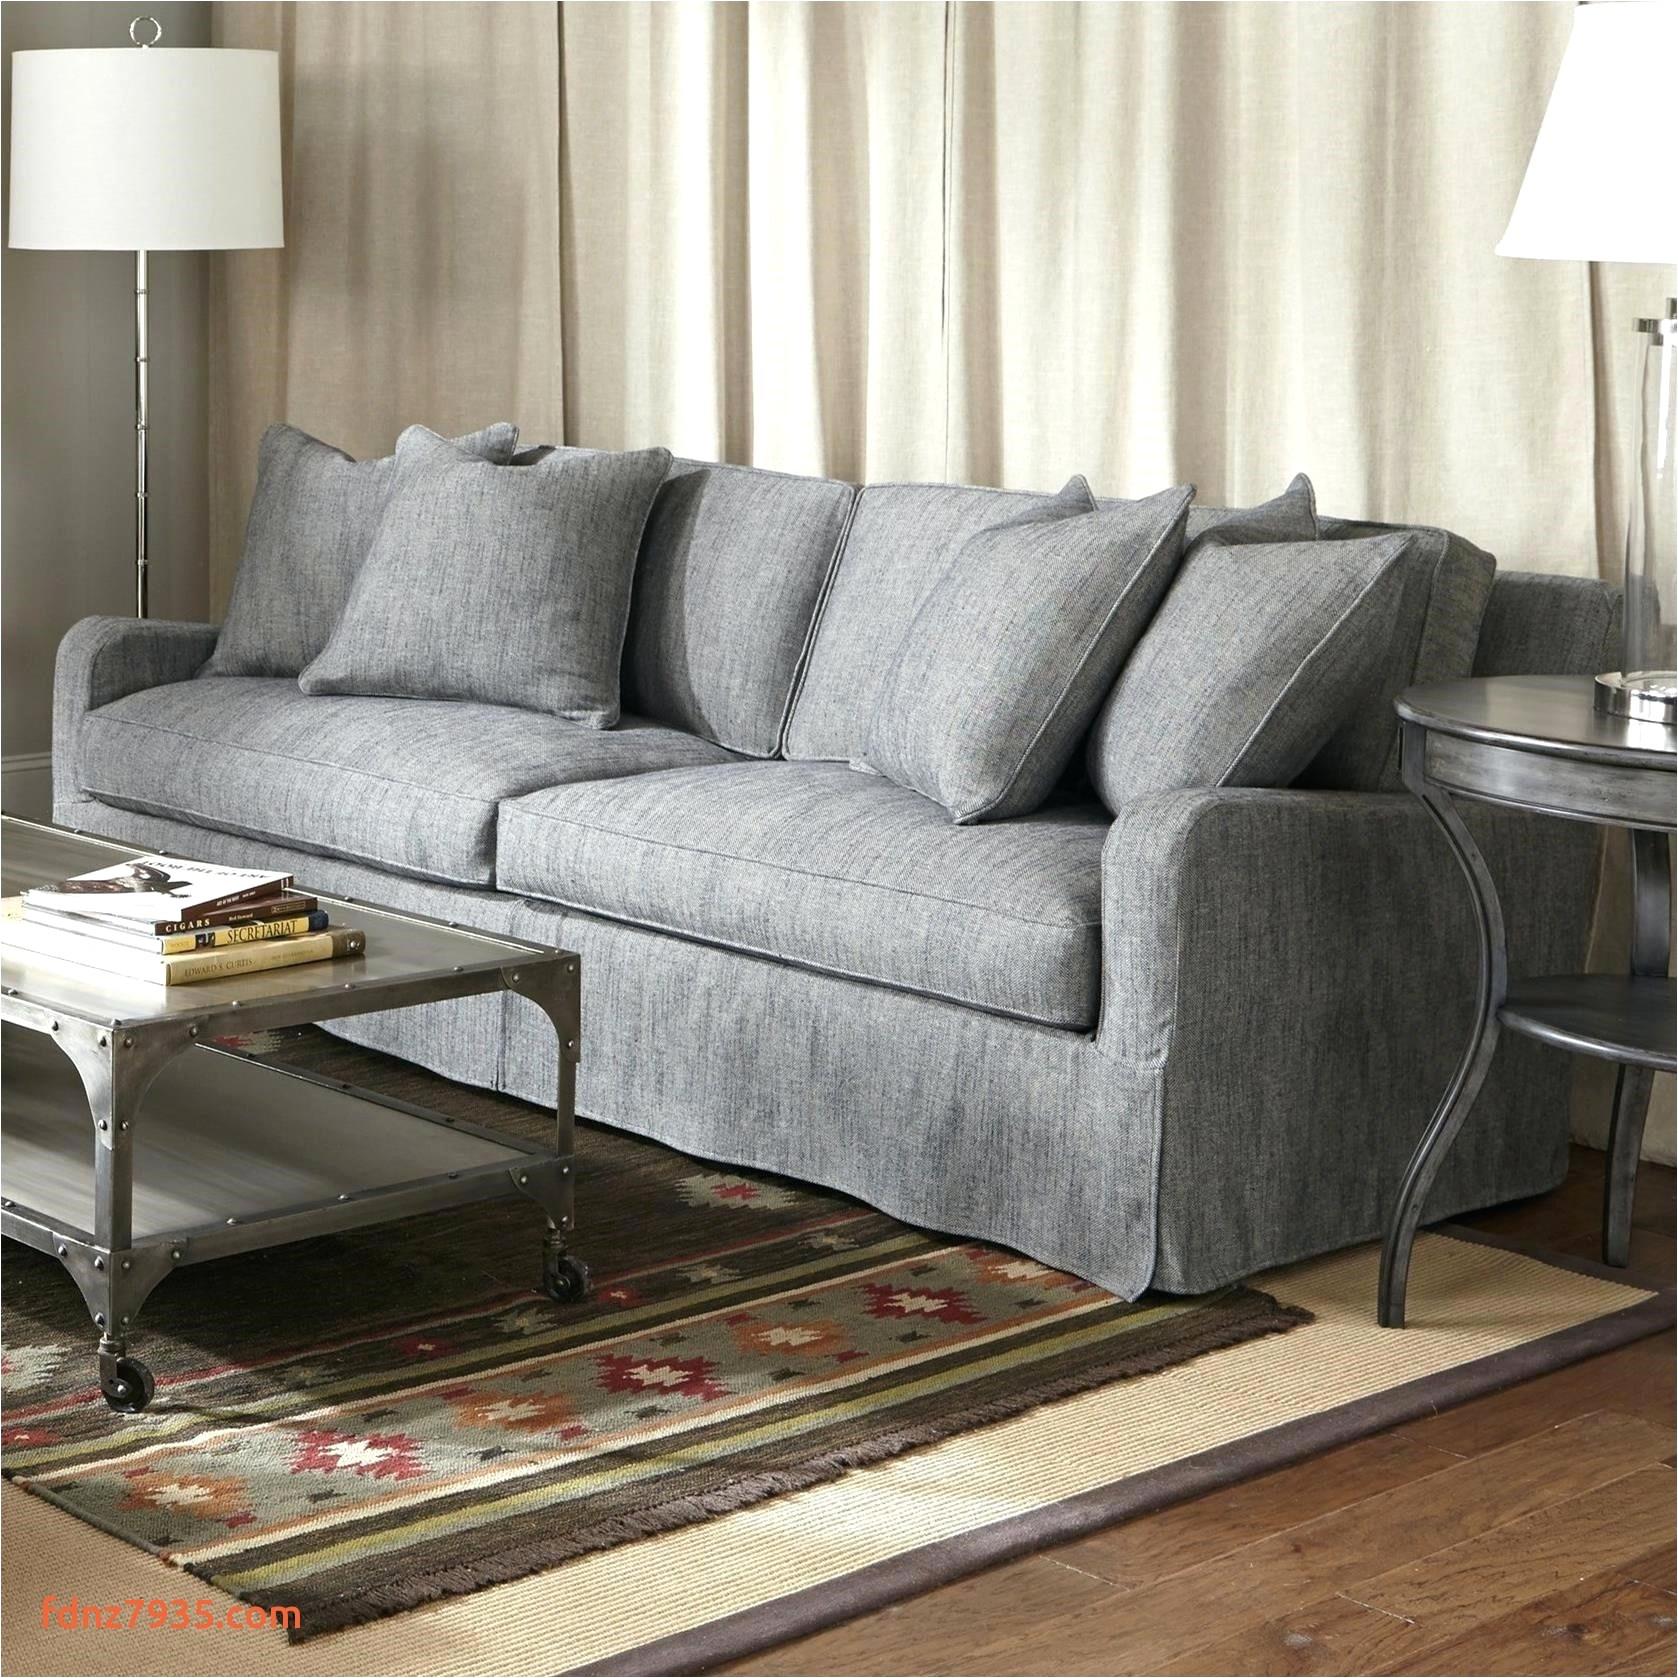 best havertys sofas lovely furniture ideas atlantic furniture nashville warehouse tn bedding 43 best havertys